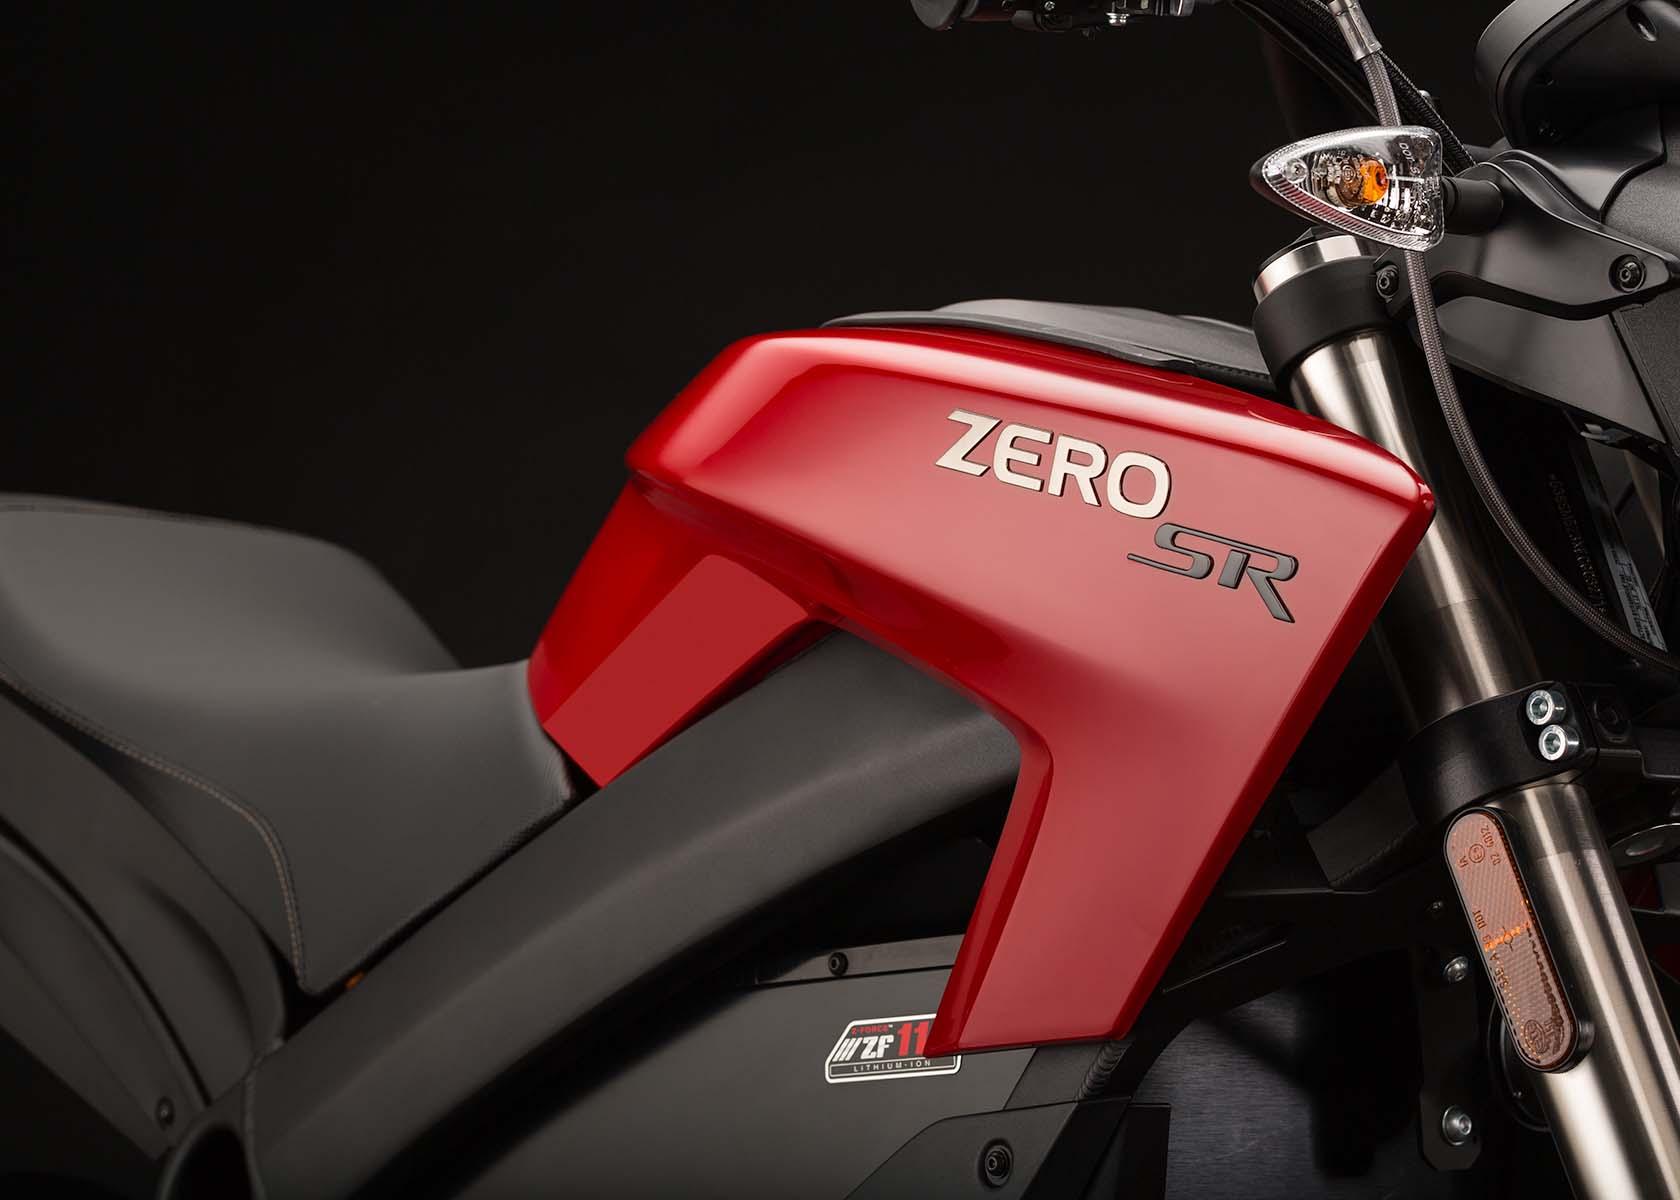 zero motorcycles debuts new zero sr at eicma asphalt. Black Bedroom Furniture Sets. Home Design Ideas